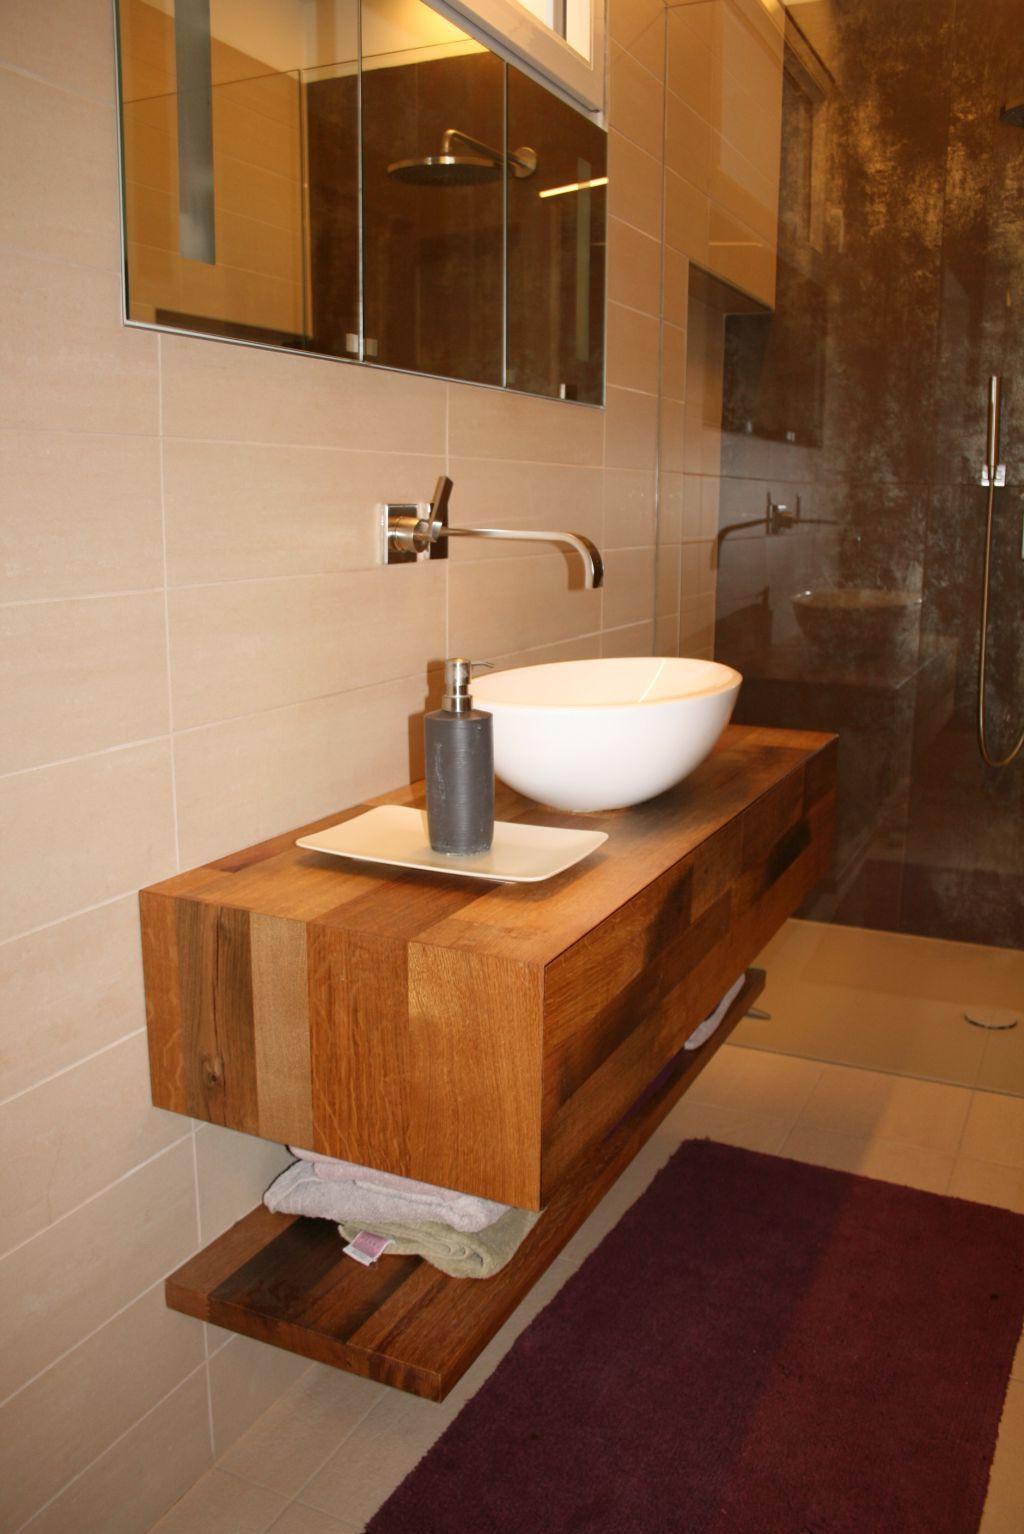 Badezimmermobel Fuhlen Sie Sich Wohl In Ihrem Wellness Lounge Bathroom Furniture Bathroom Decor Bathroom